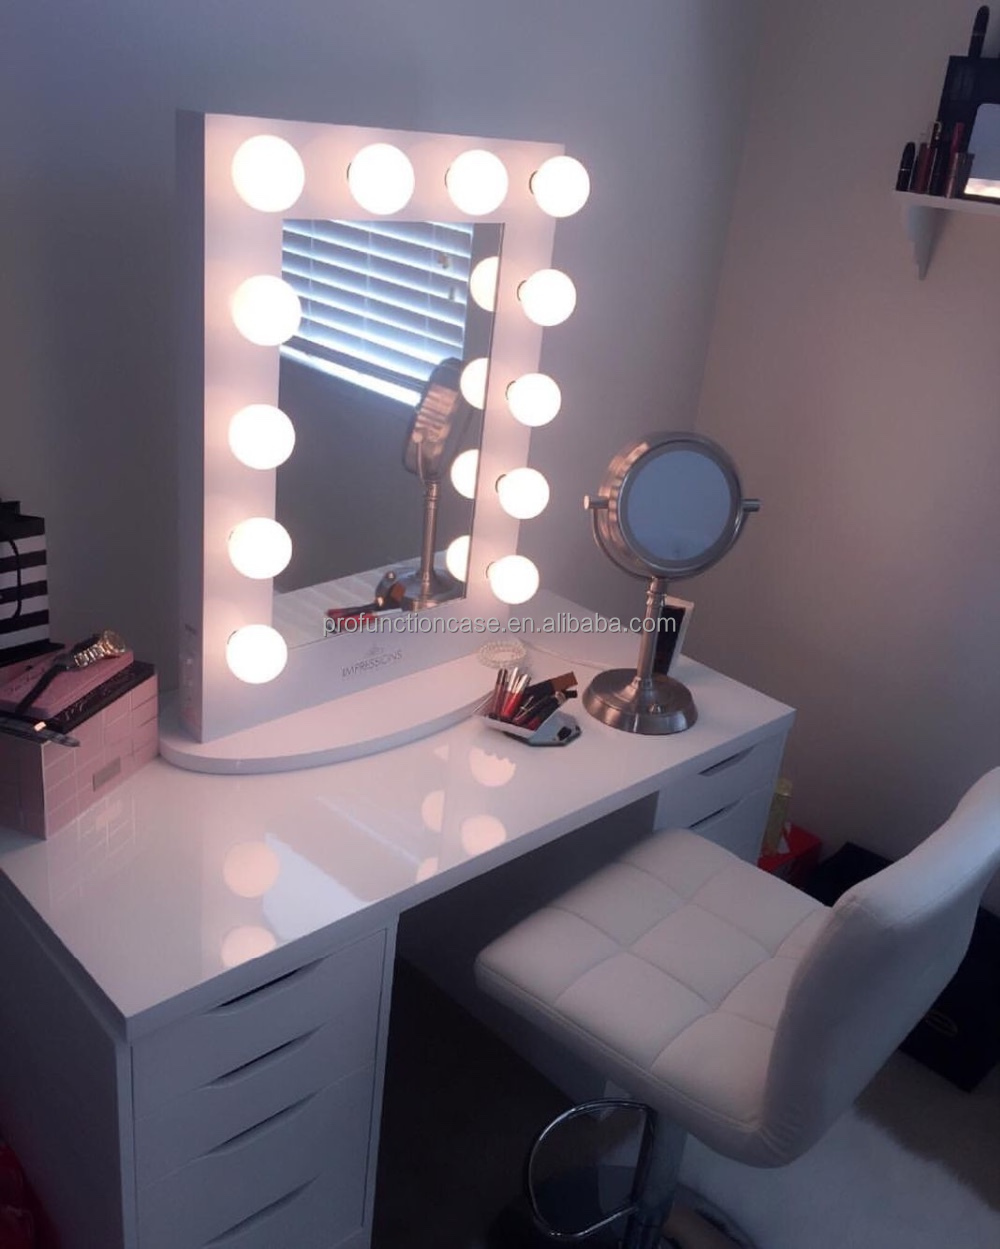 Manufacturer hollywood vanity mirror special offer hollywood vanity